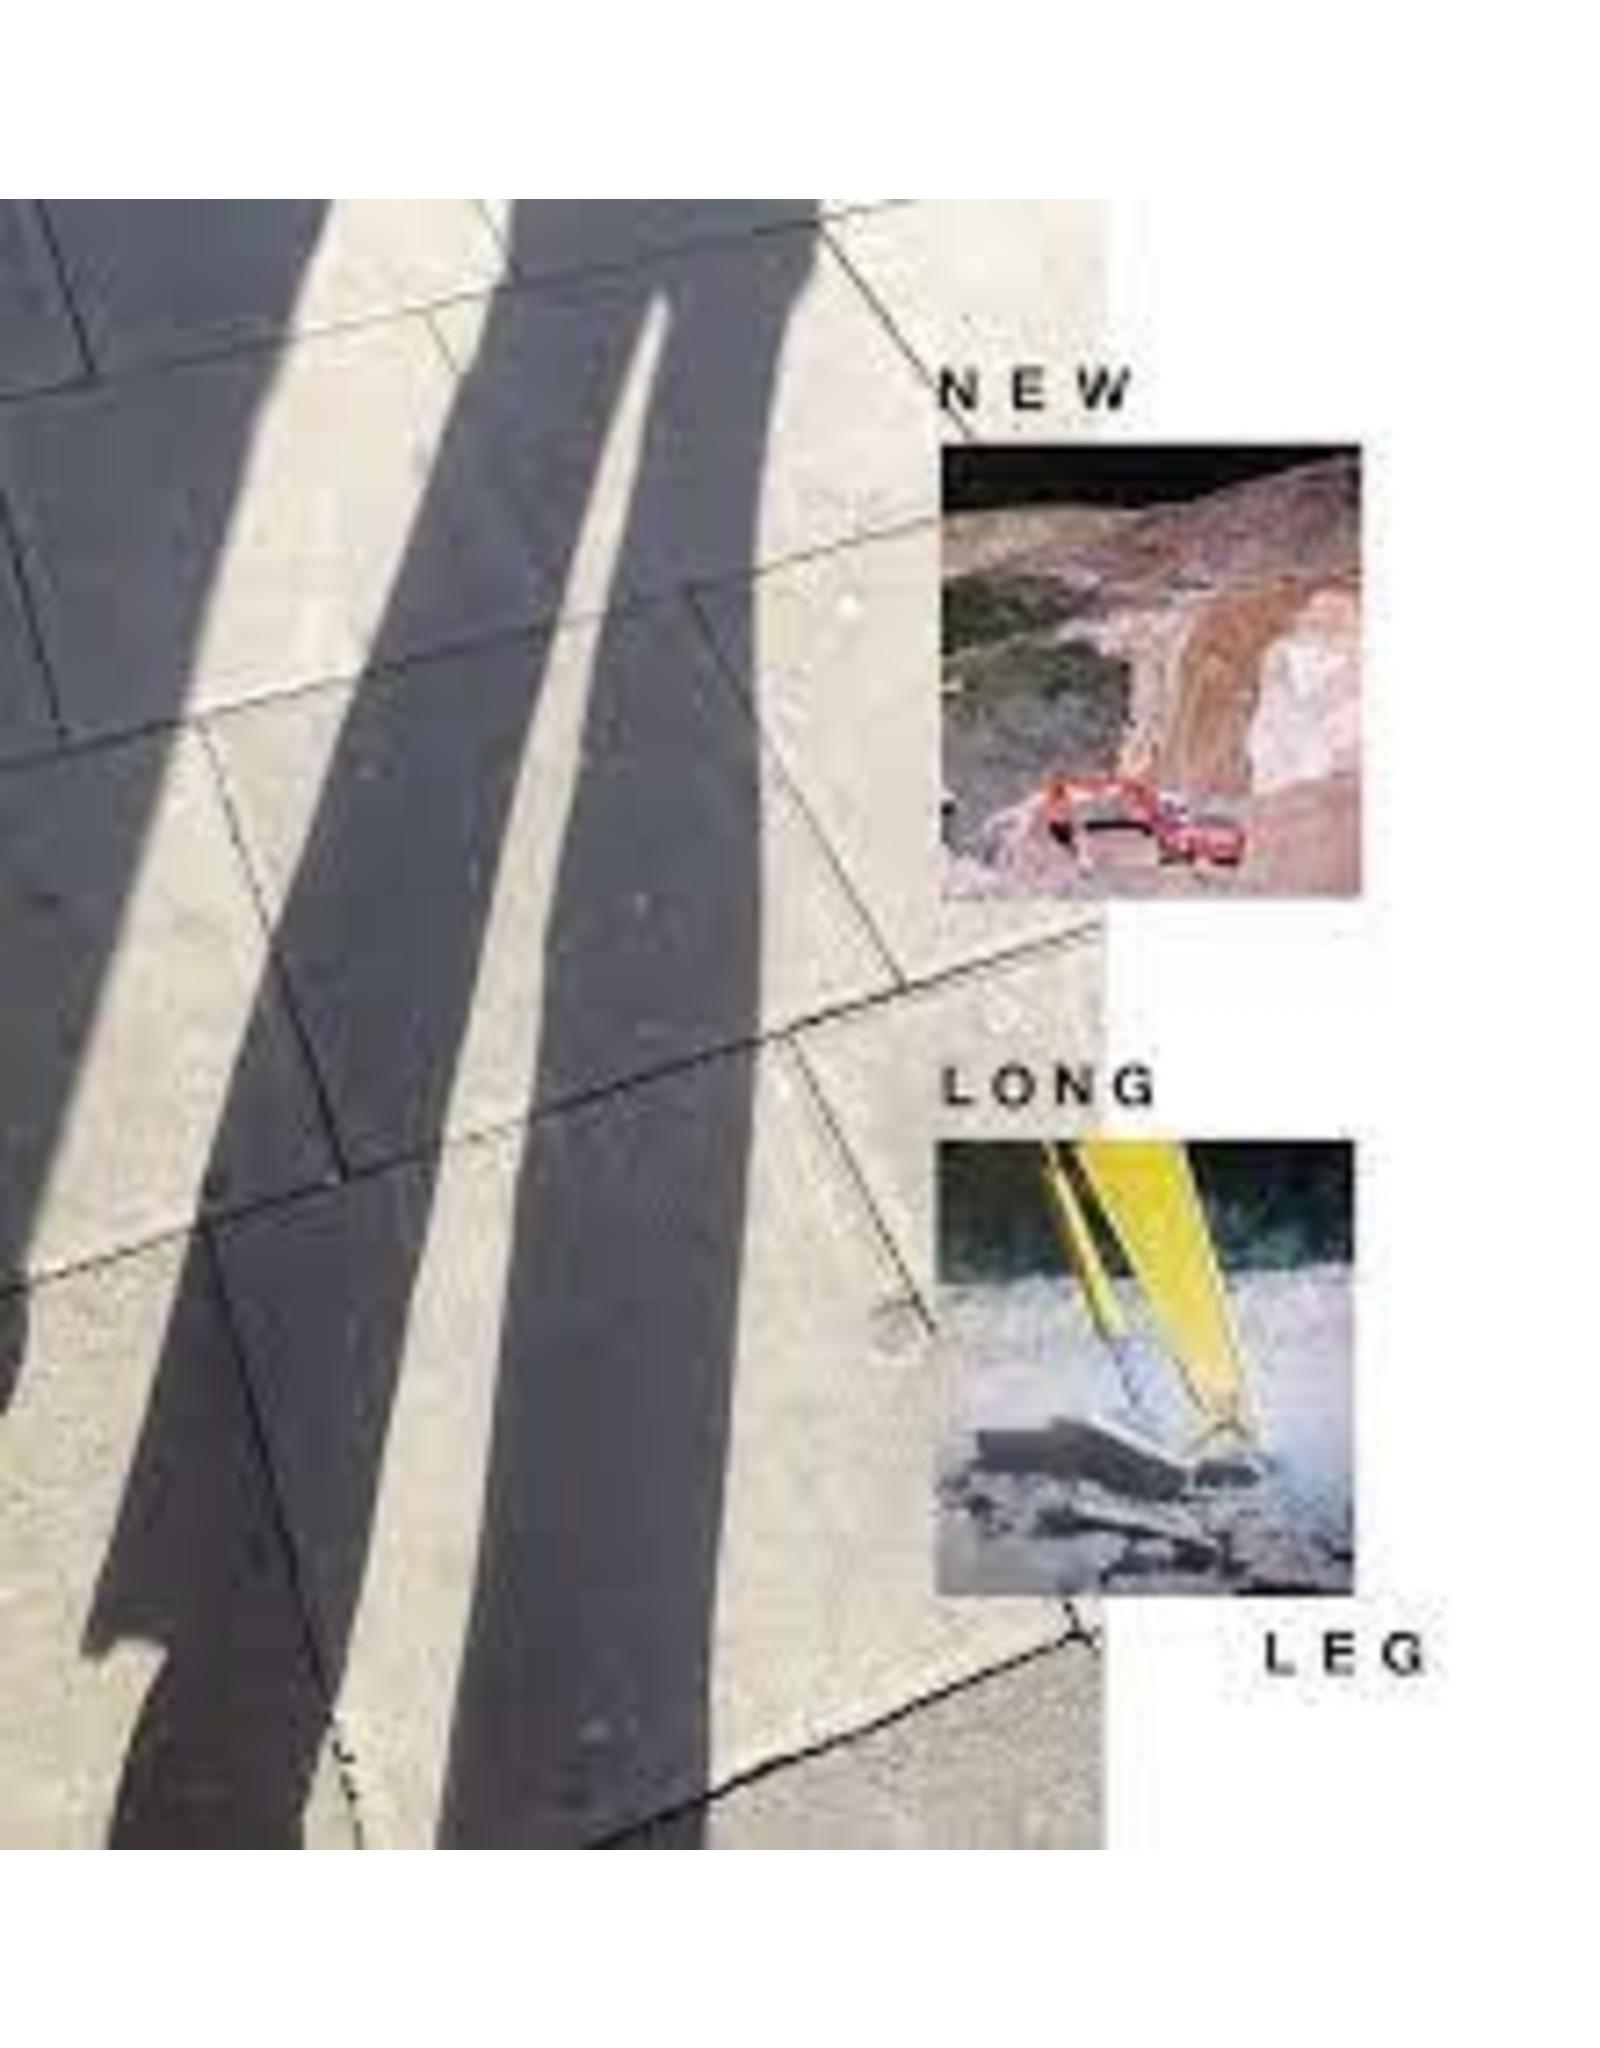 Dry Cleaning - New Long Leg CD